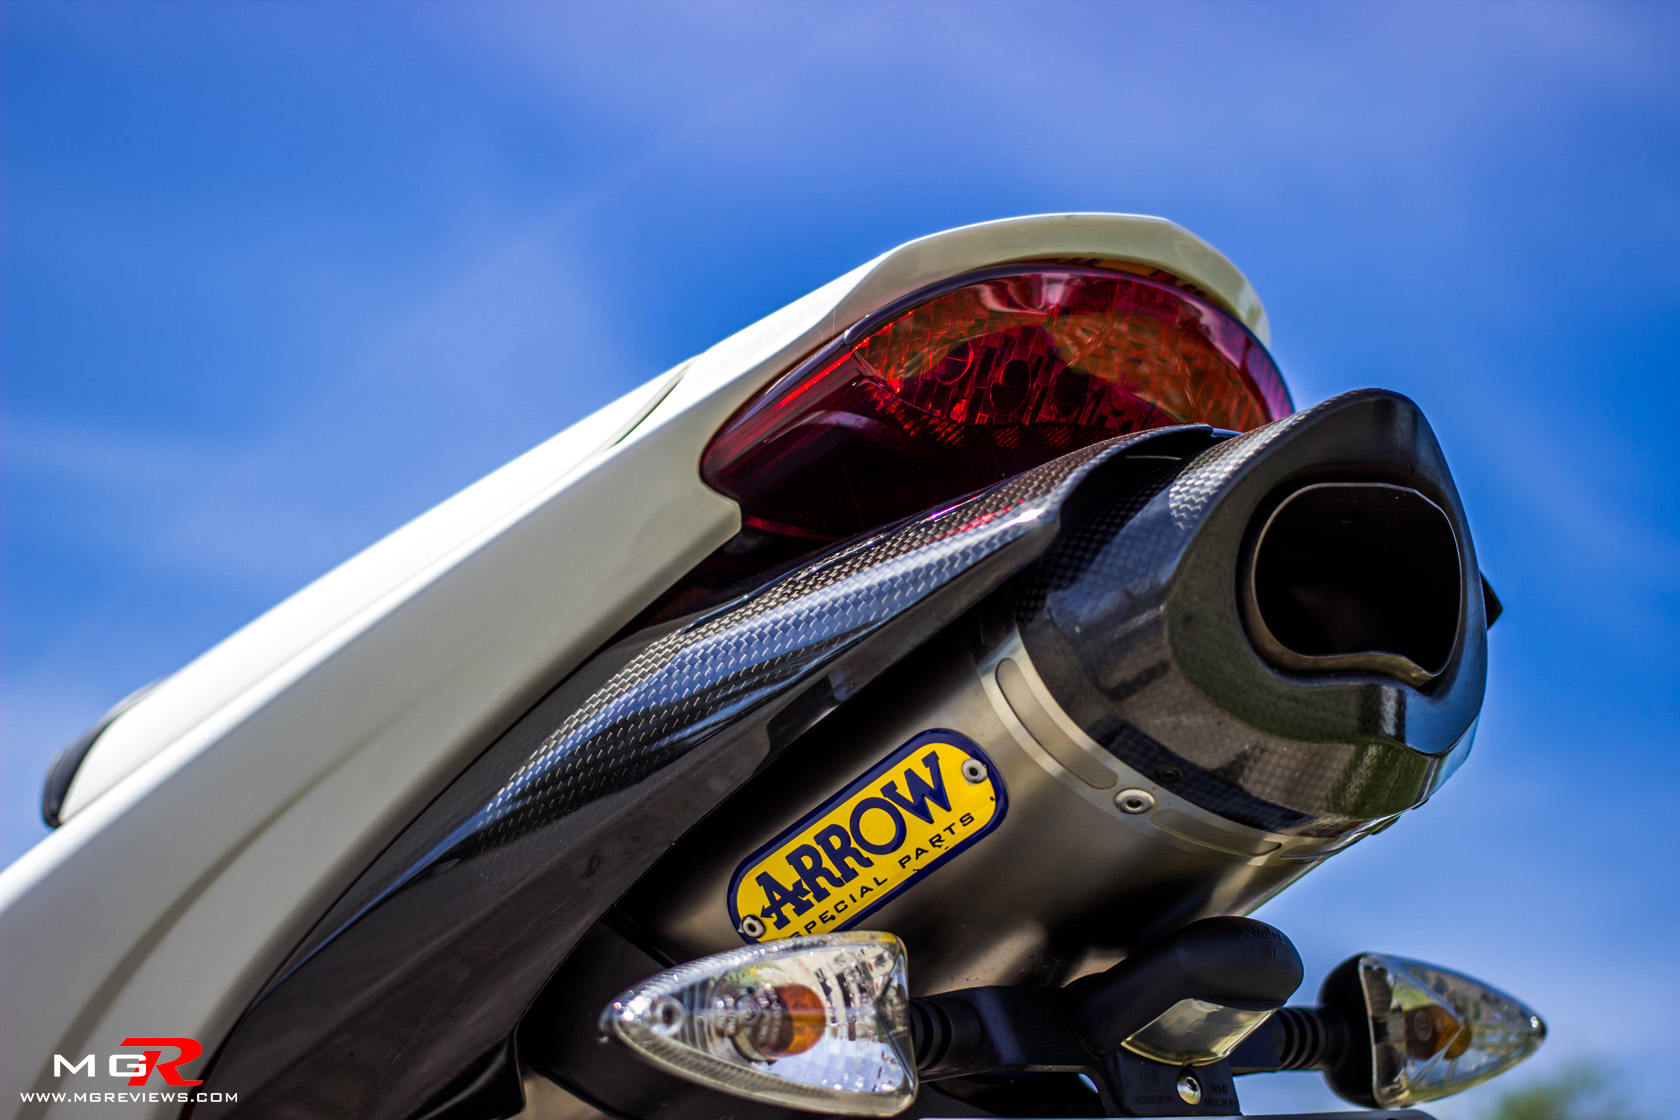 Review: 2012 Triumph Daytona 675R – M.G.Reviews